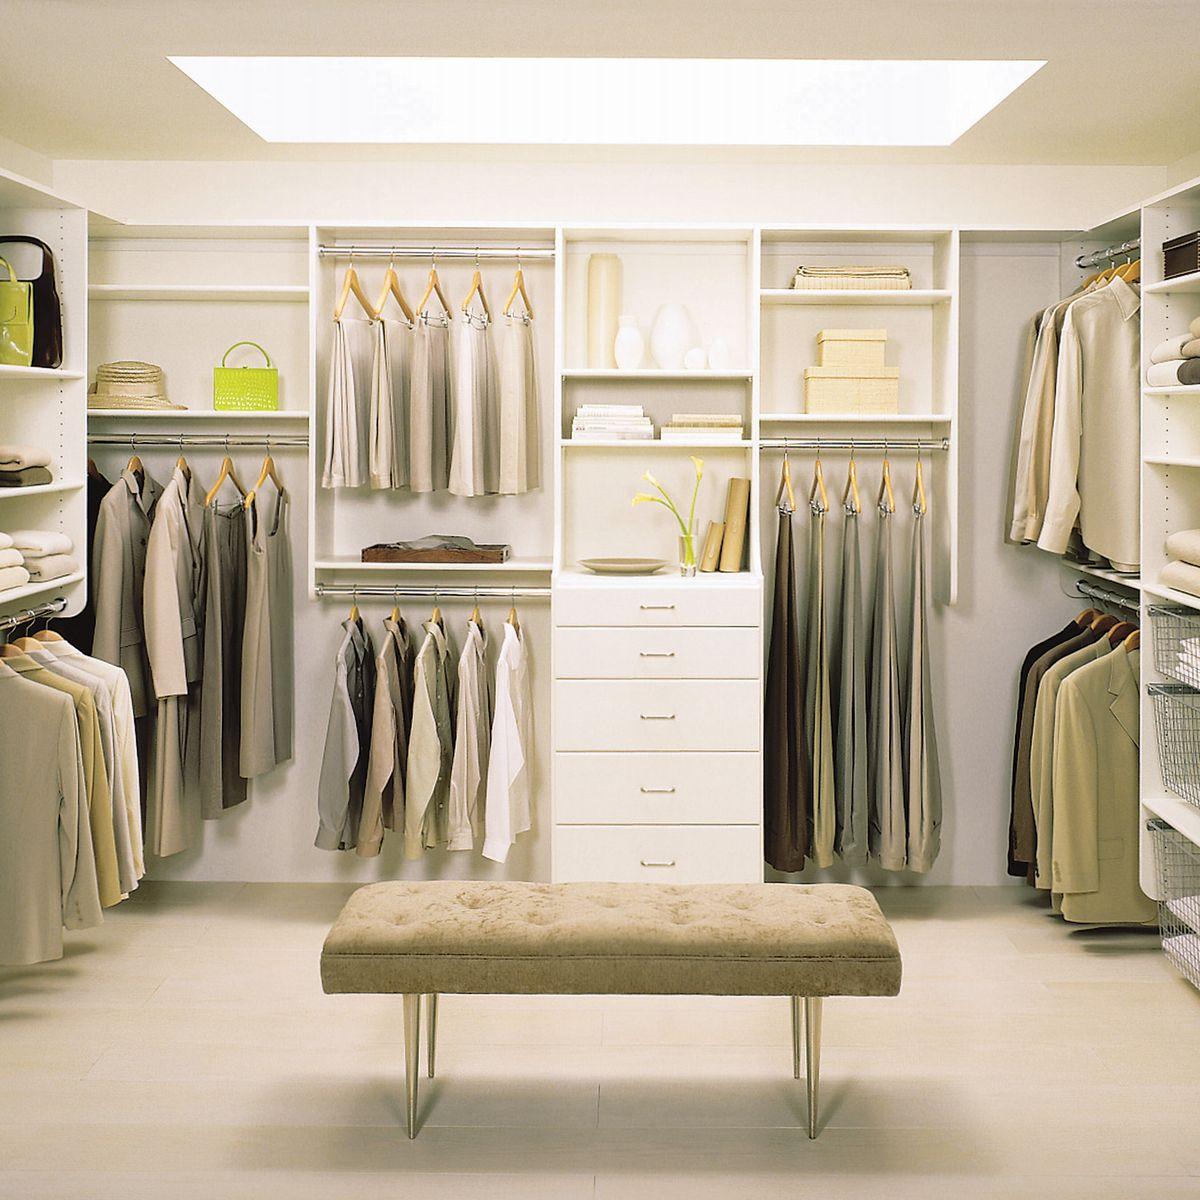 large-walk-in-closet-design-photo-14